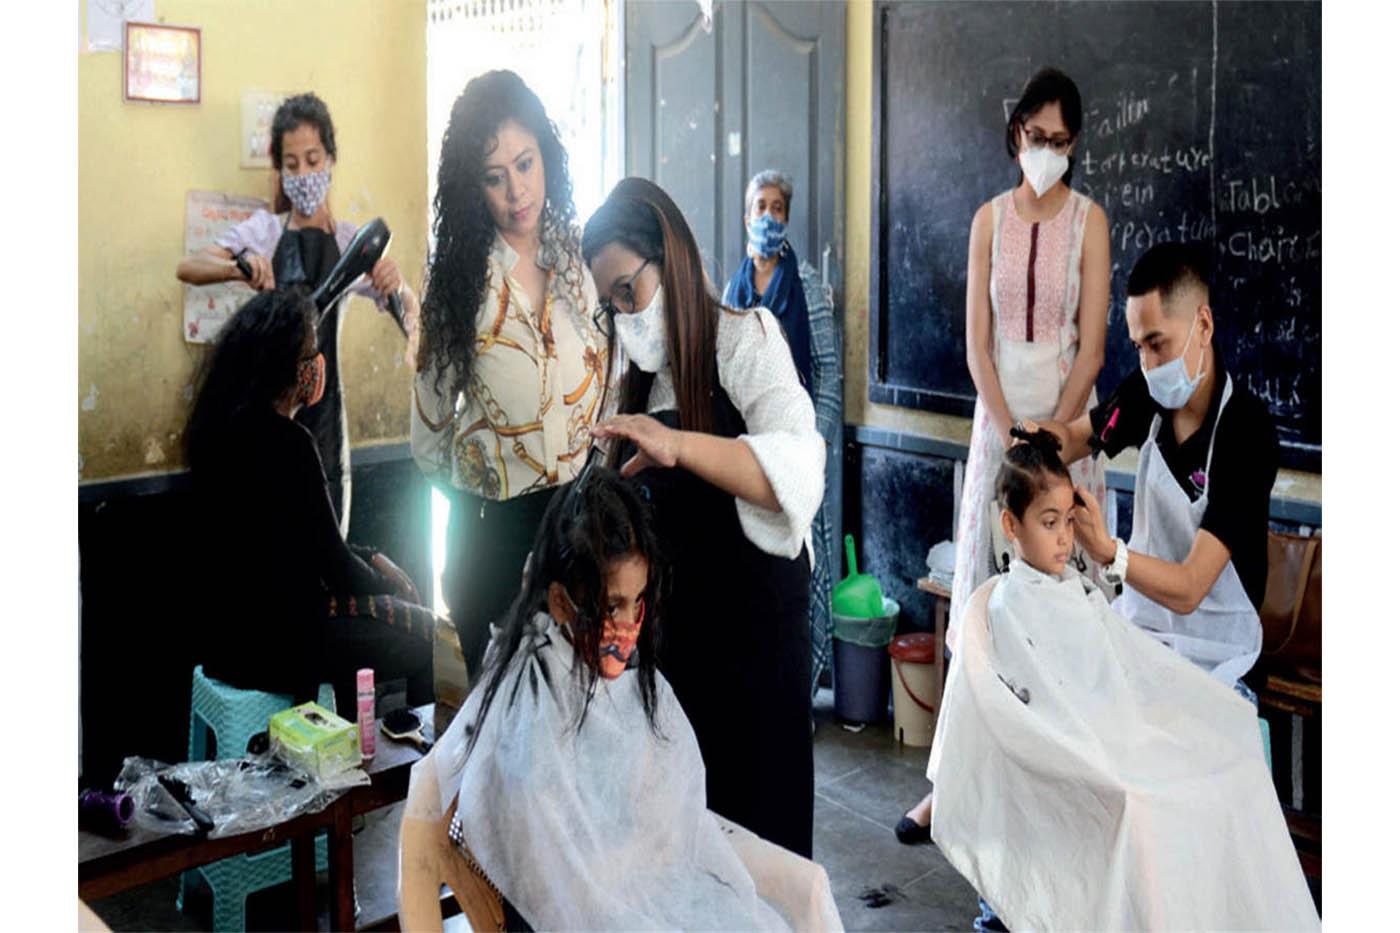 Bengaluru stylists give free haircuts to 30 girls